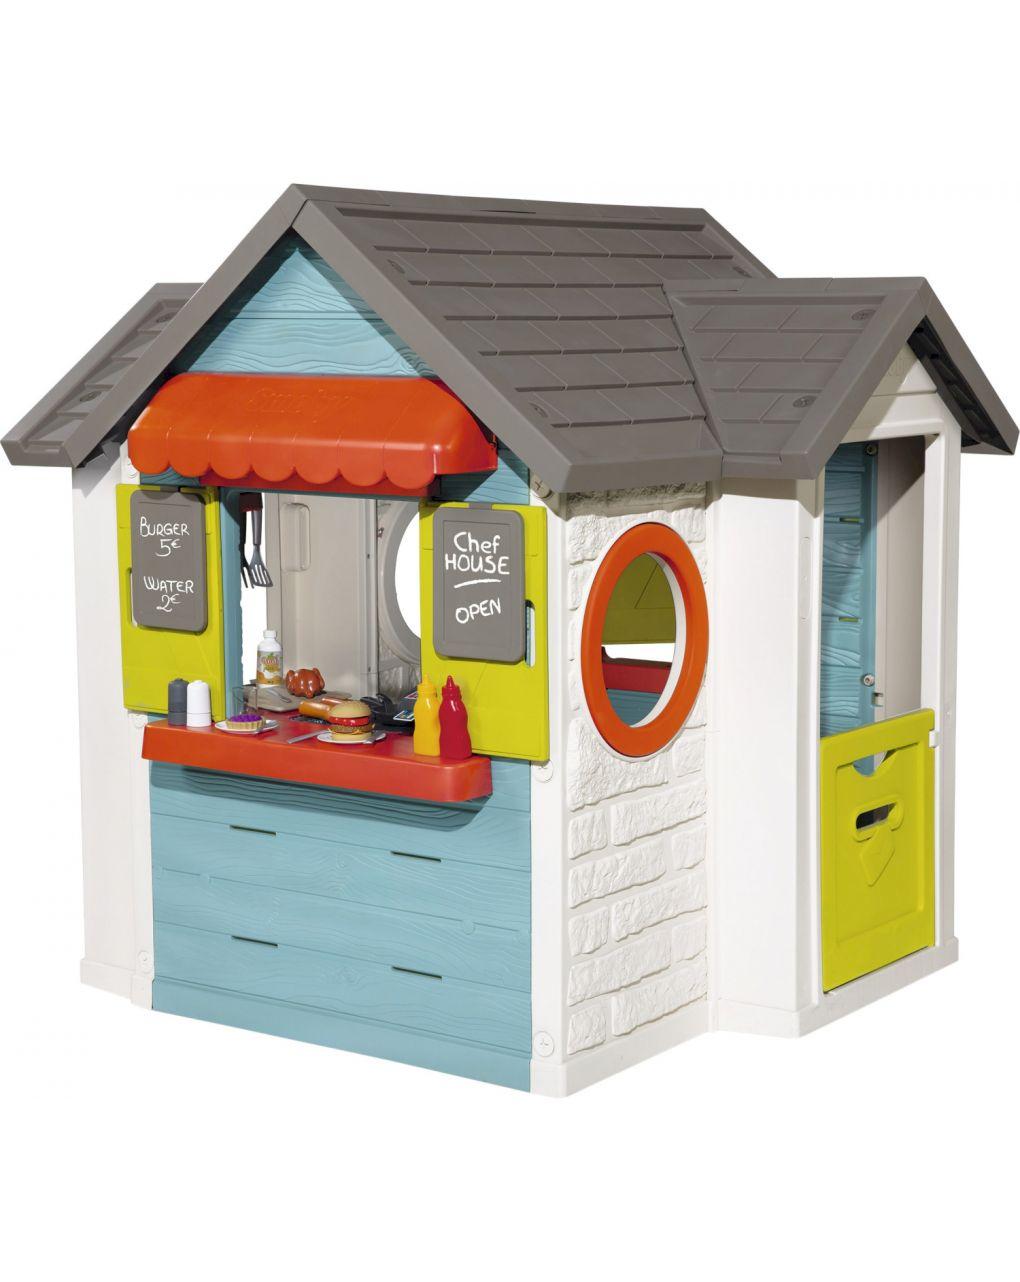 Smoby - casa chef house - Smoby